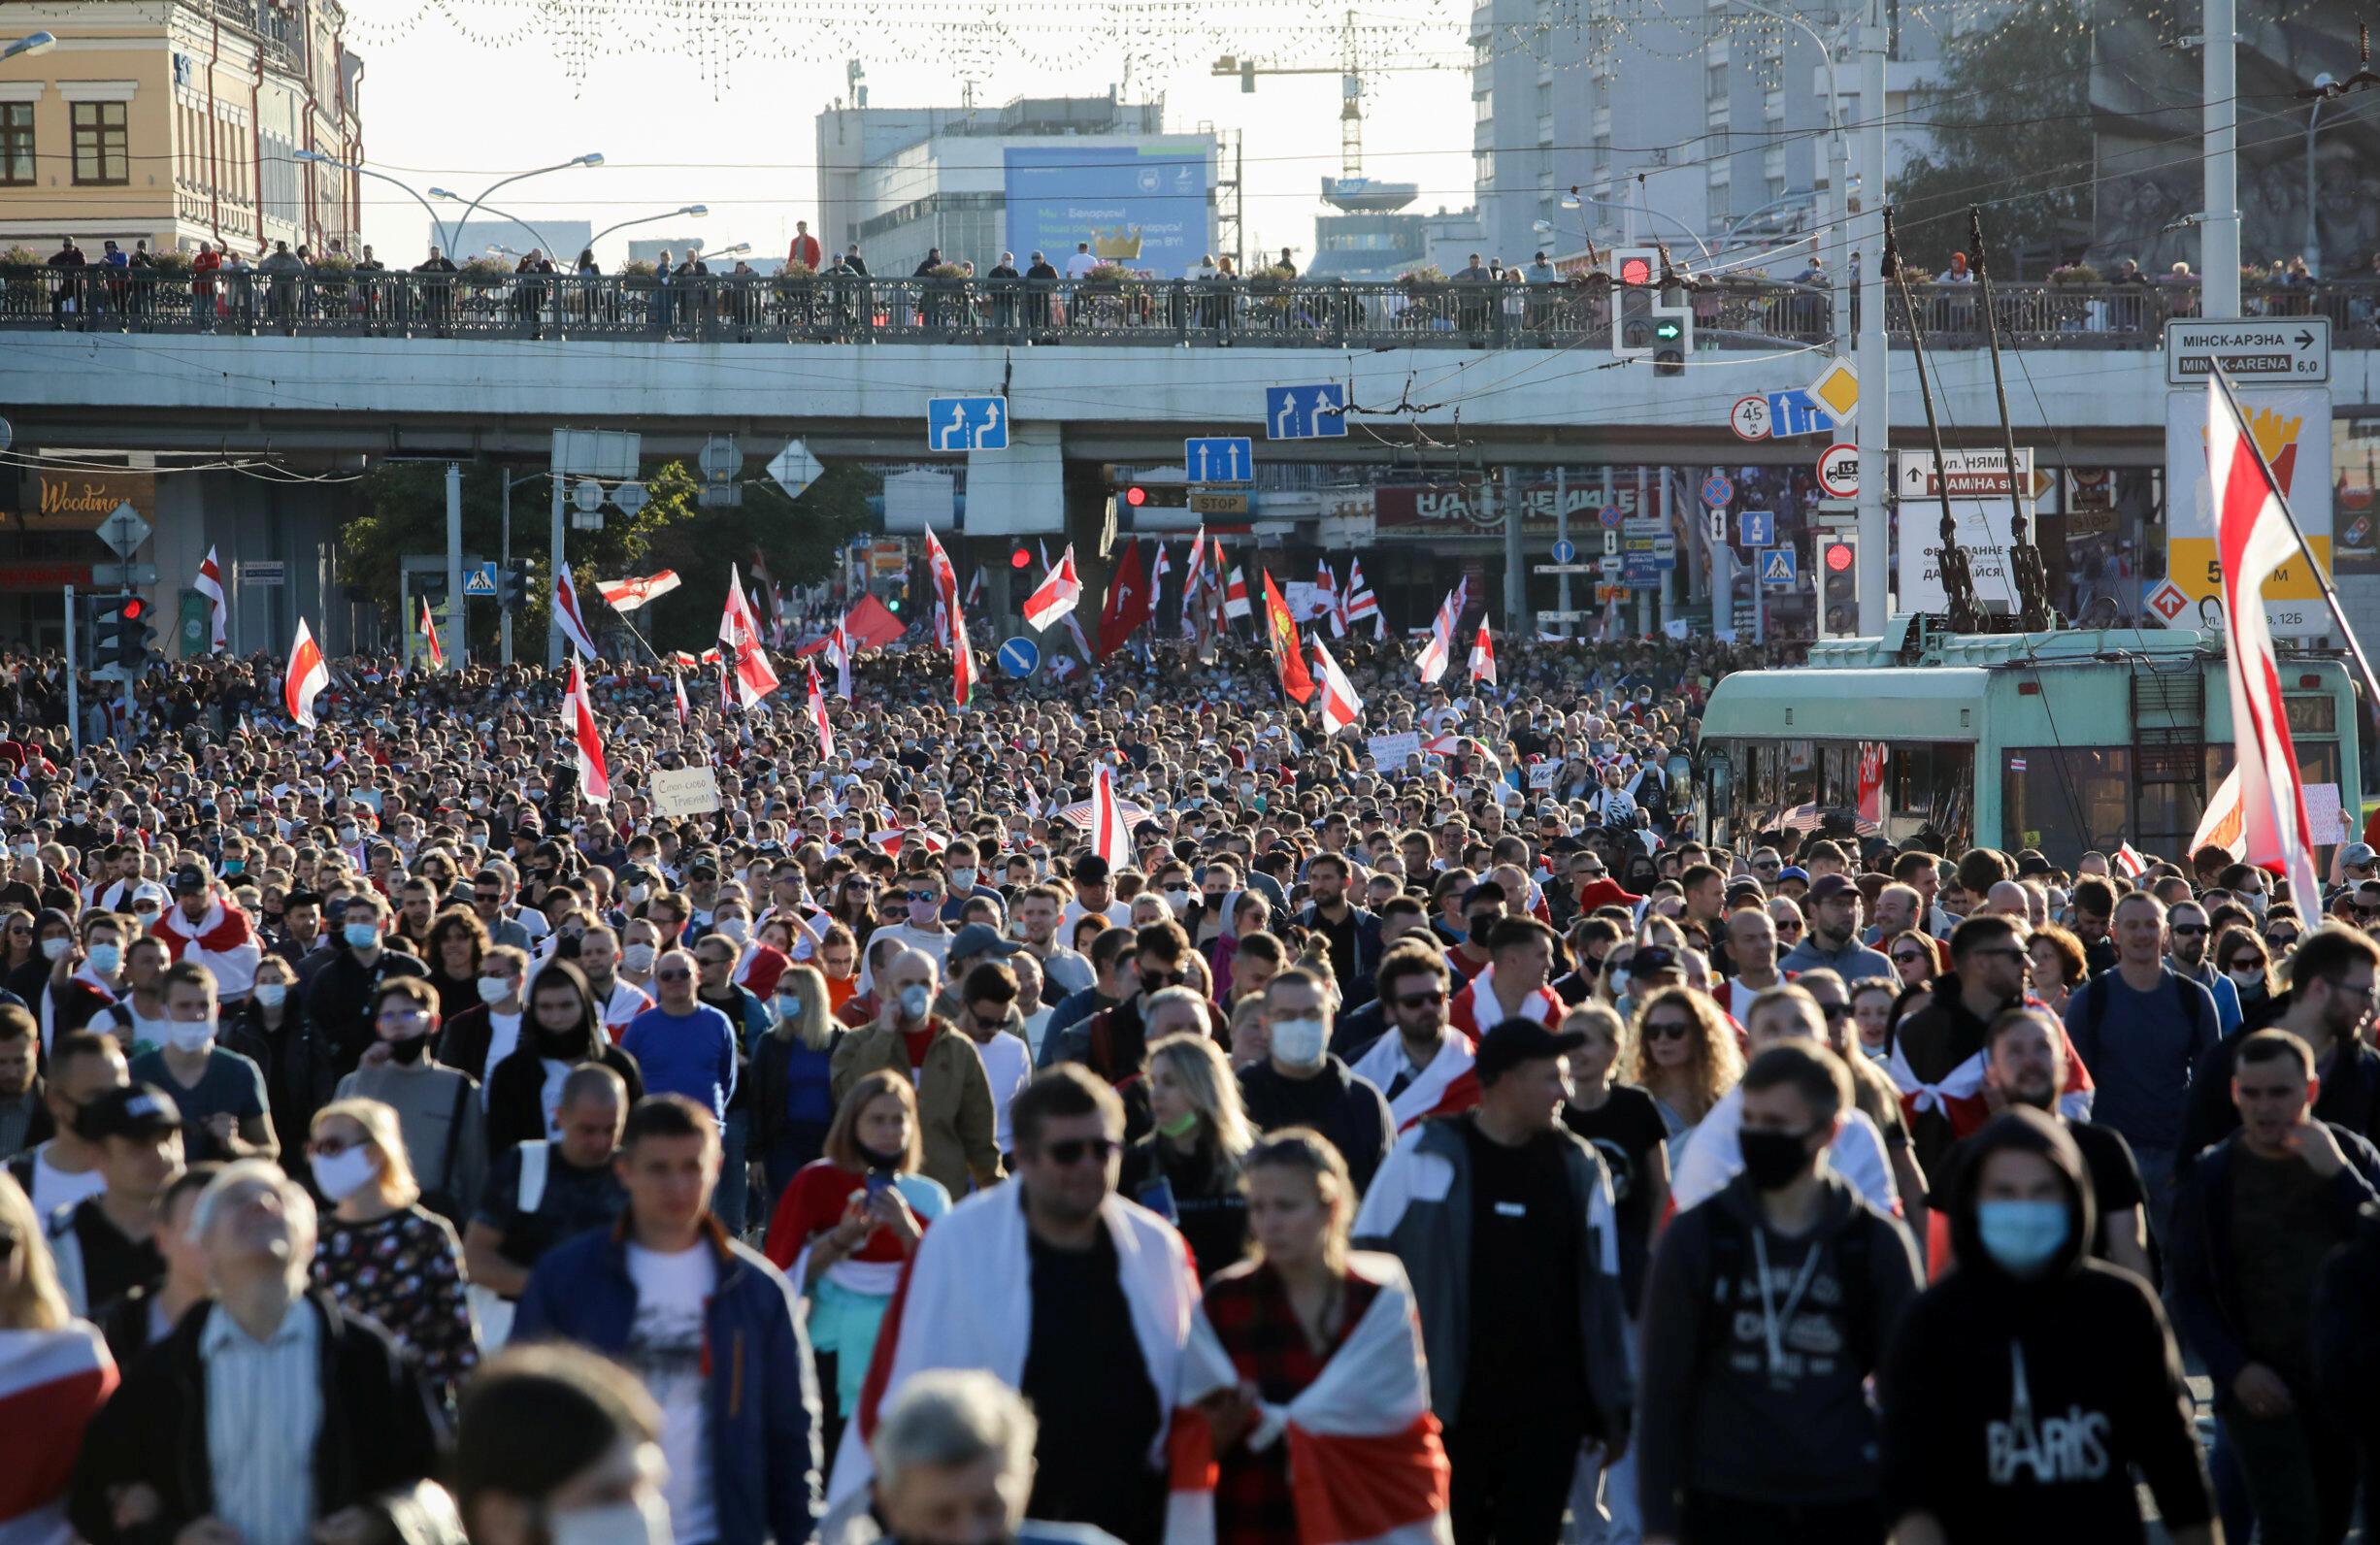 2020-09-20T190856Z_153835102_RC2J2J9OJLGI_RTRMADP_3_BELARUS-ELECTION-PROTESTS